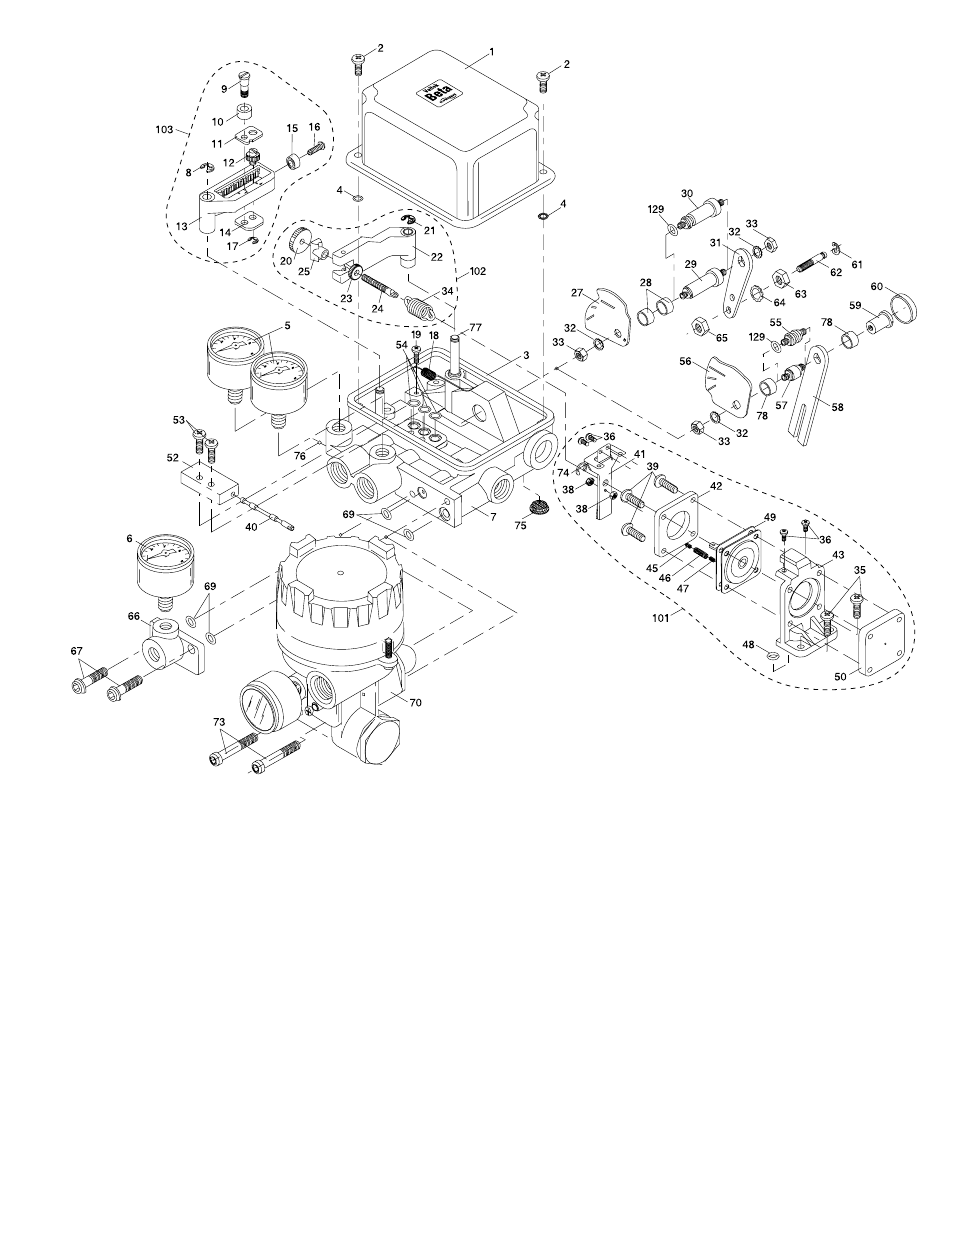 Figure 17: beta positioner